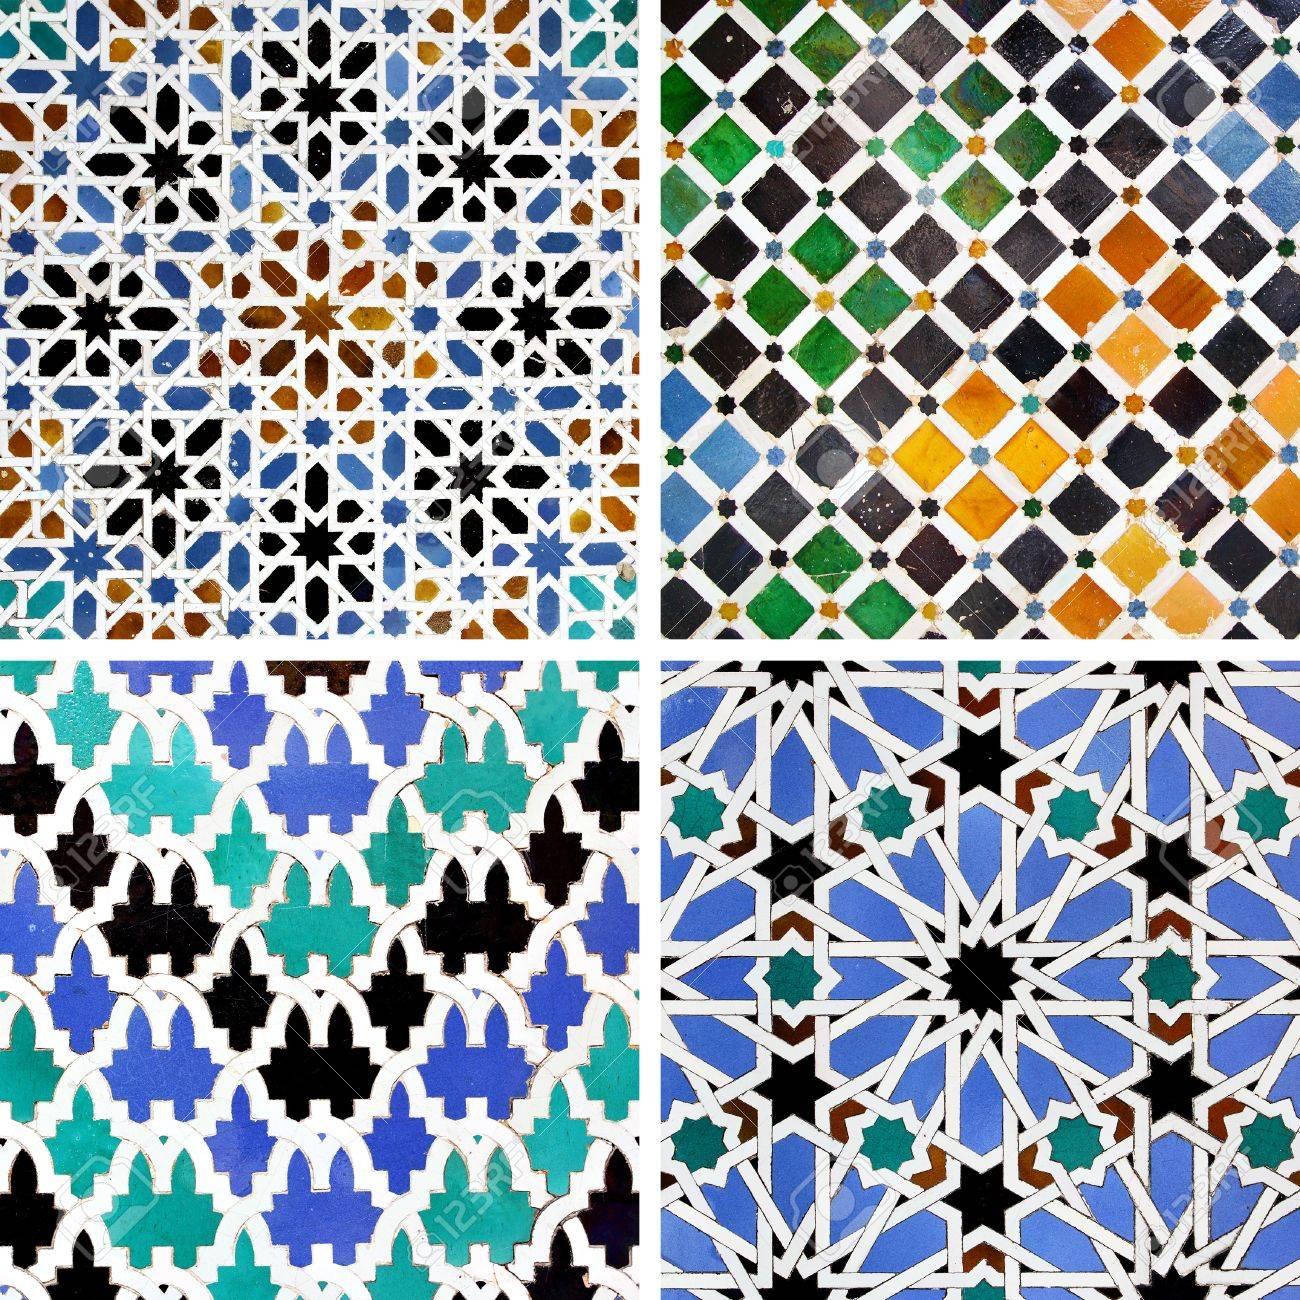 Ancient moorish ceramic tiles with pattern stock photo picture ancient moorish ceramic tiles with pattern stock photo 19911186 dailygadgetfo Choice Image